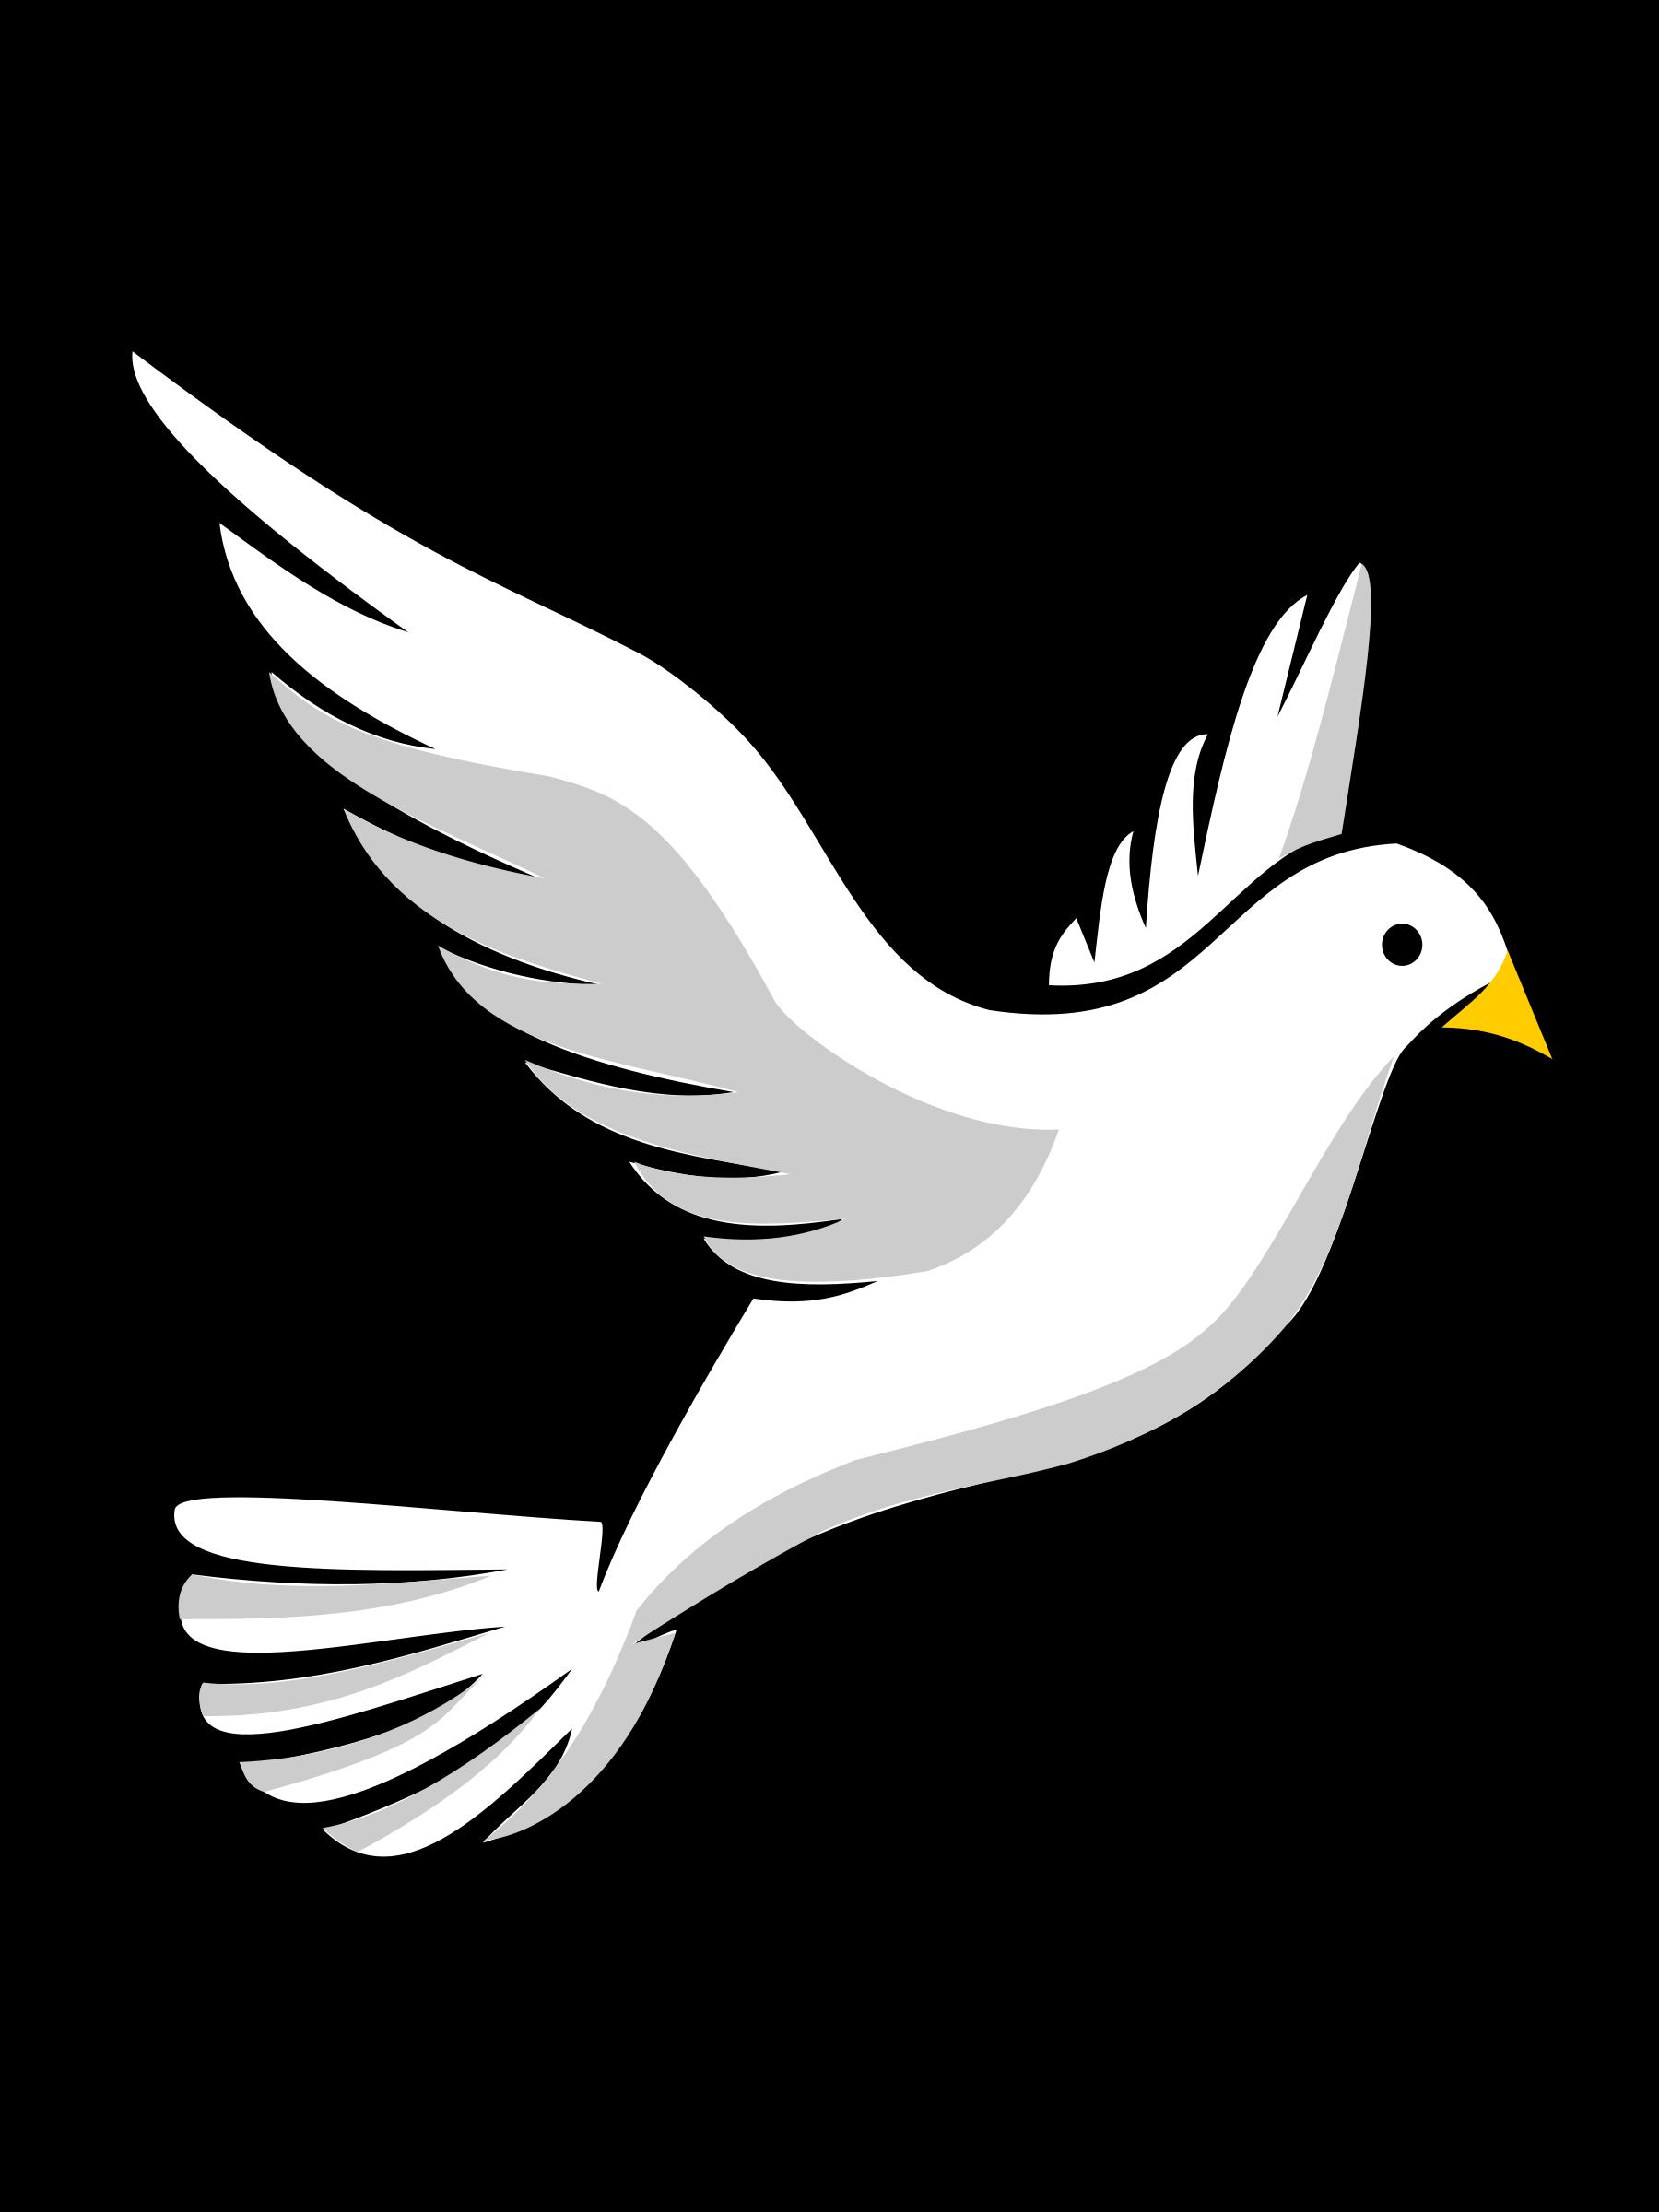 1800x2400 Flying Bird Clipart